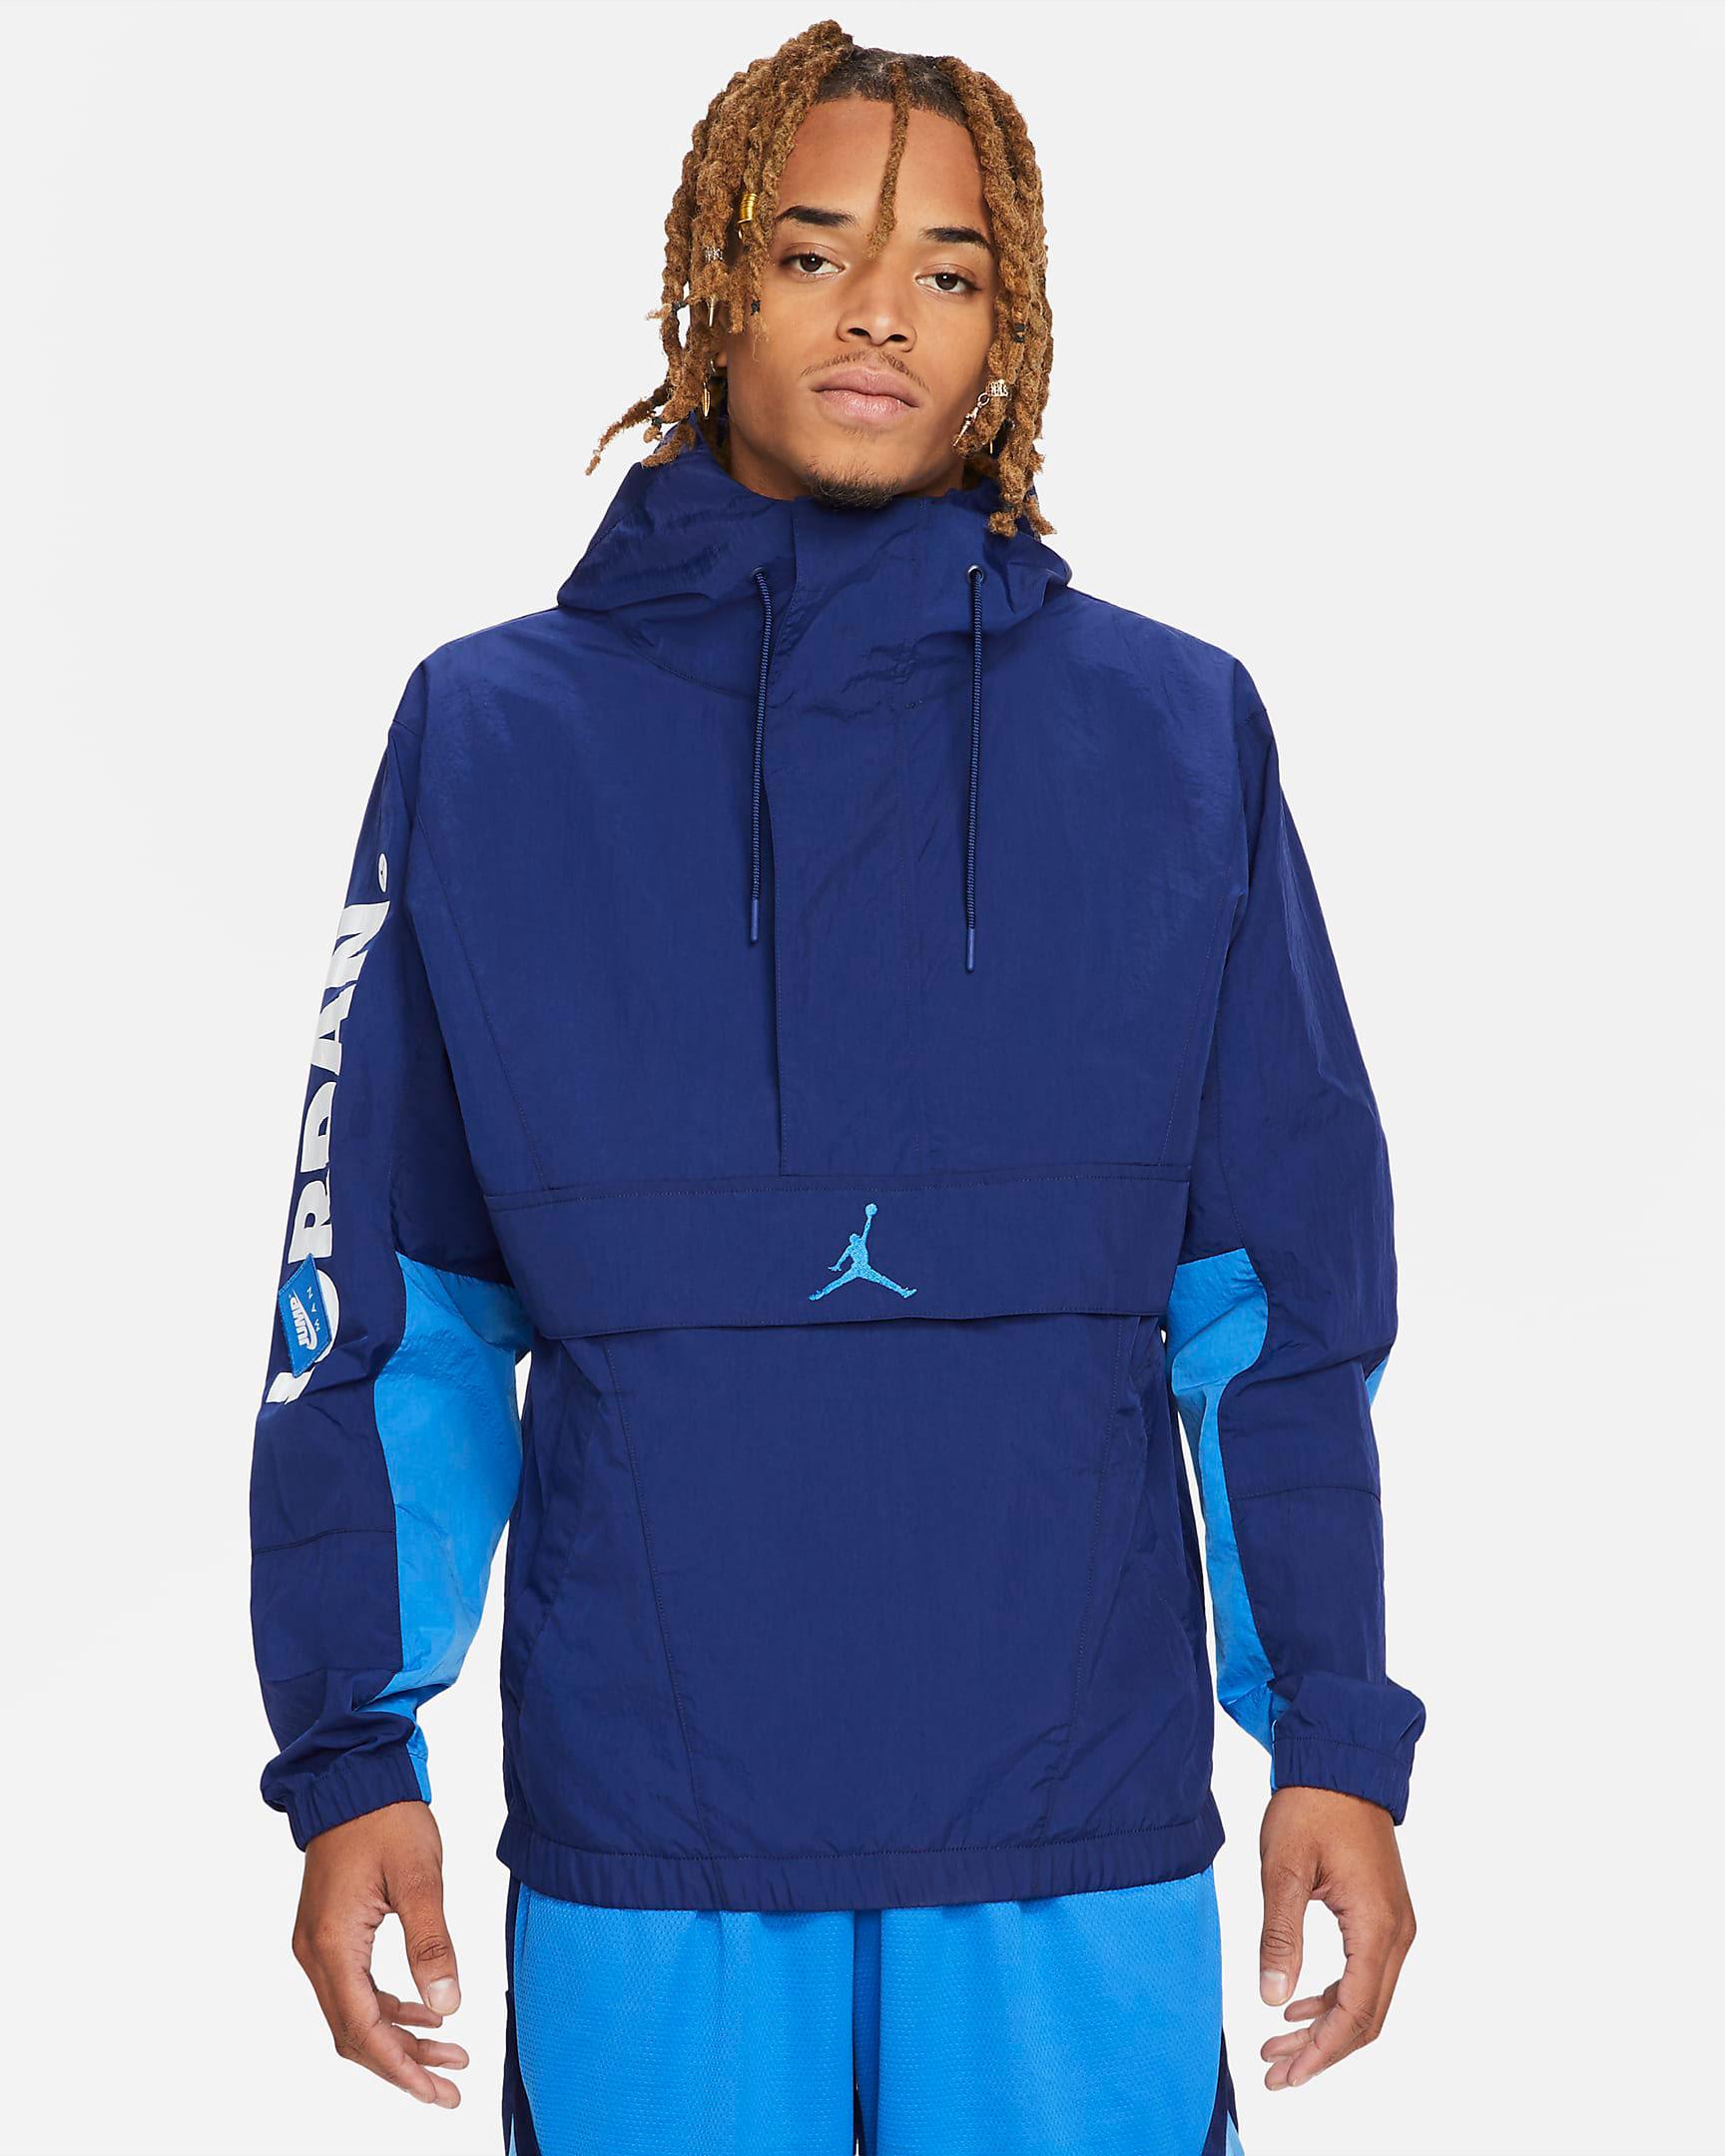 jordan-jumpman-classics-blue-jacket-spring-2021-1